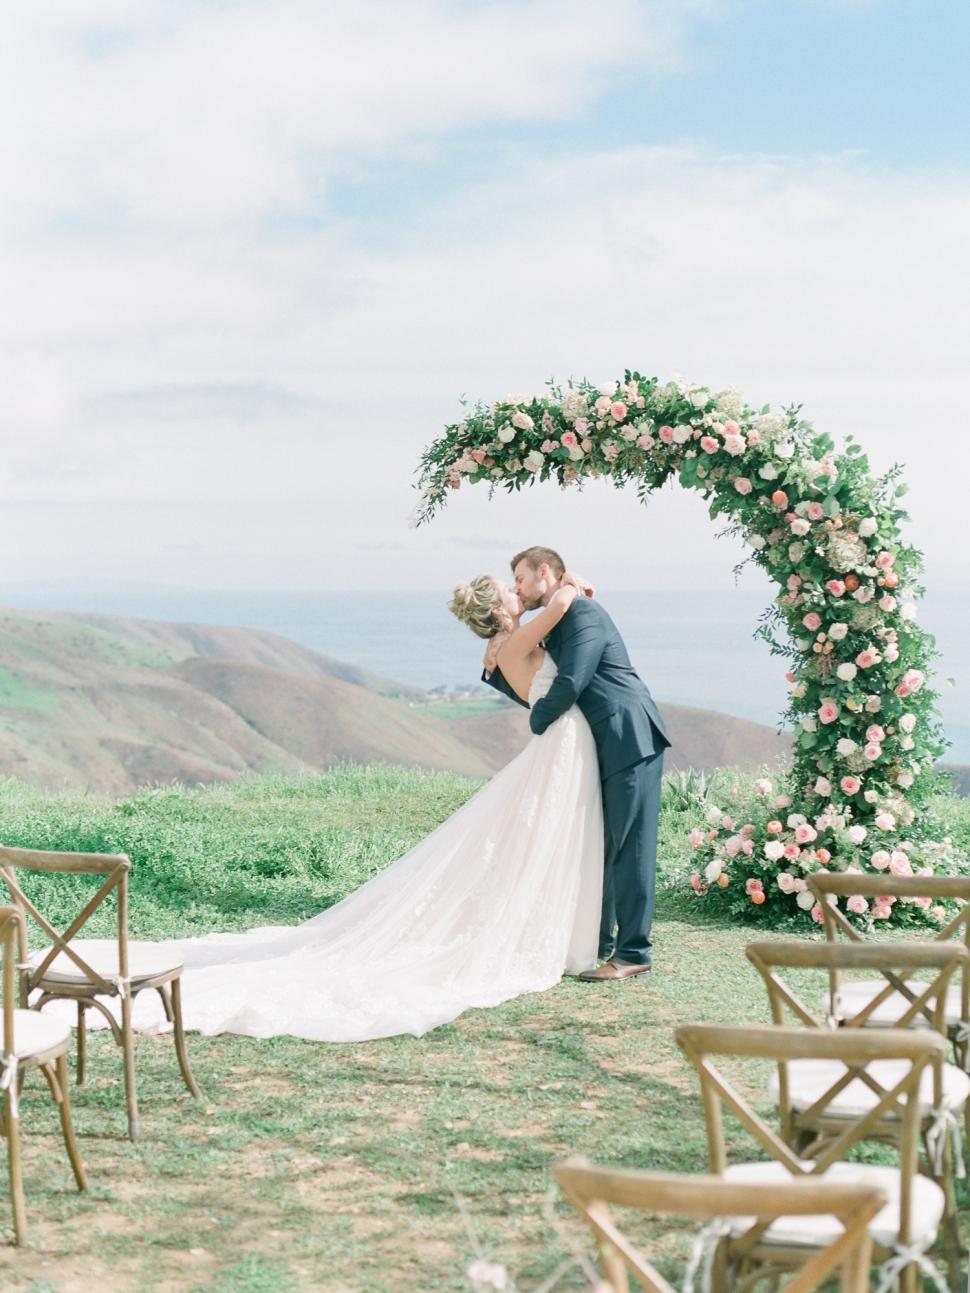 Southern-California-Malibu-Wedding-Photographer-Cassi-Claire-Deer-Creek-Ridge-Wedding_09.jpg